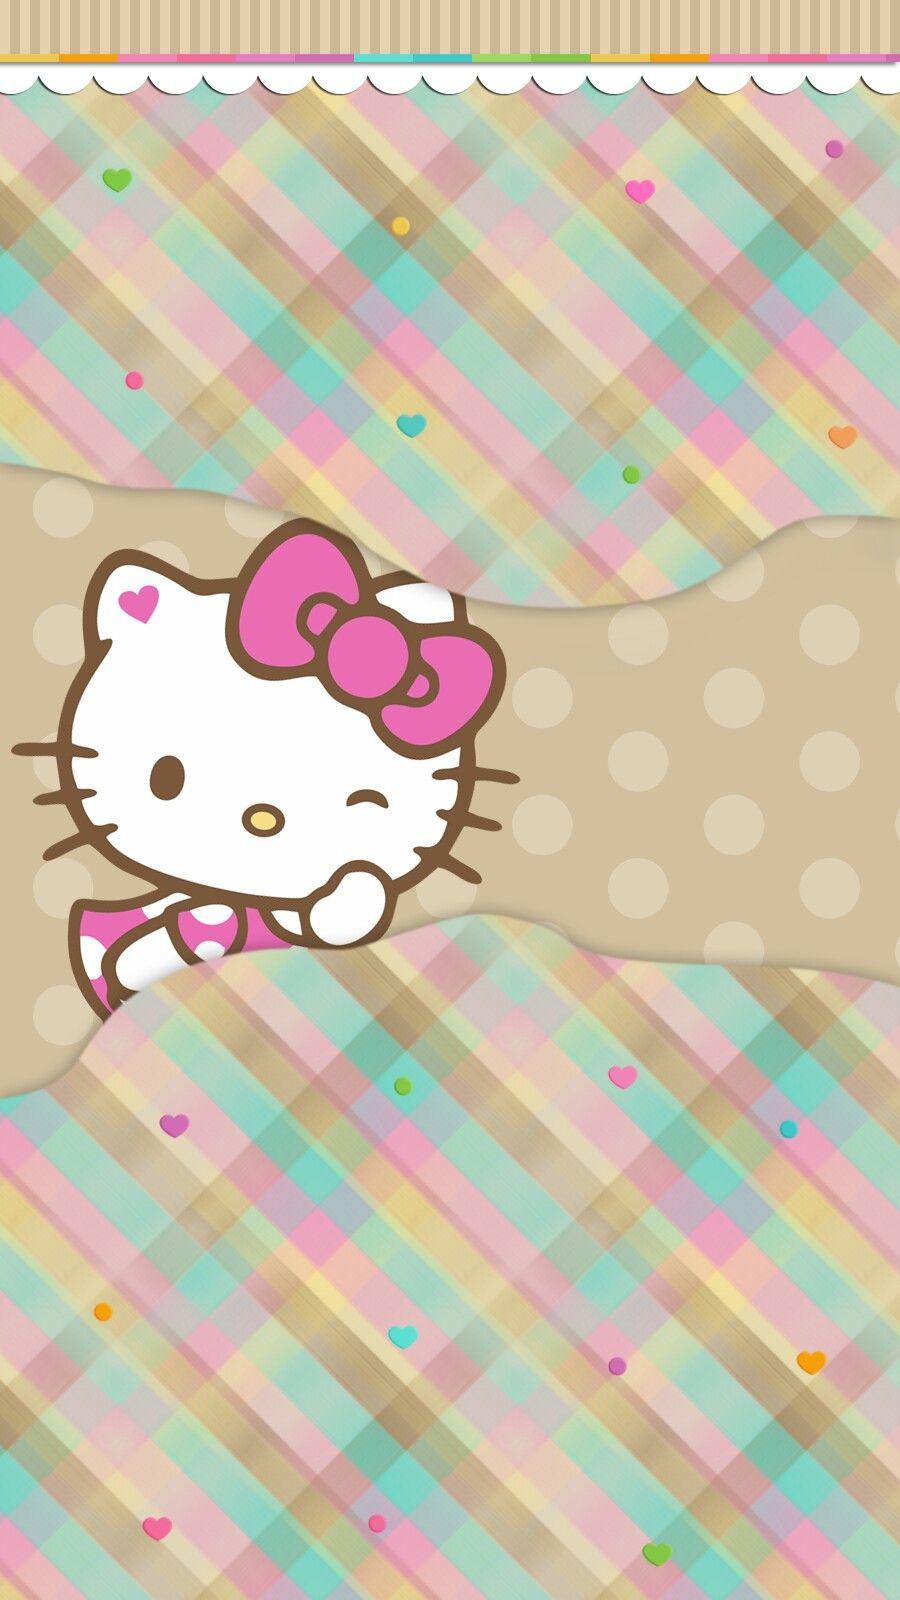 Hello Kitty Wallpaper Android Iphone Hello Kitty Backgrounds Hello Kitty Hello Kitty Images